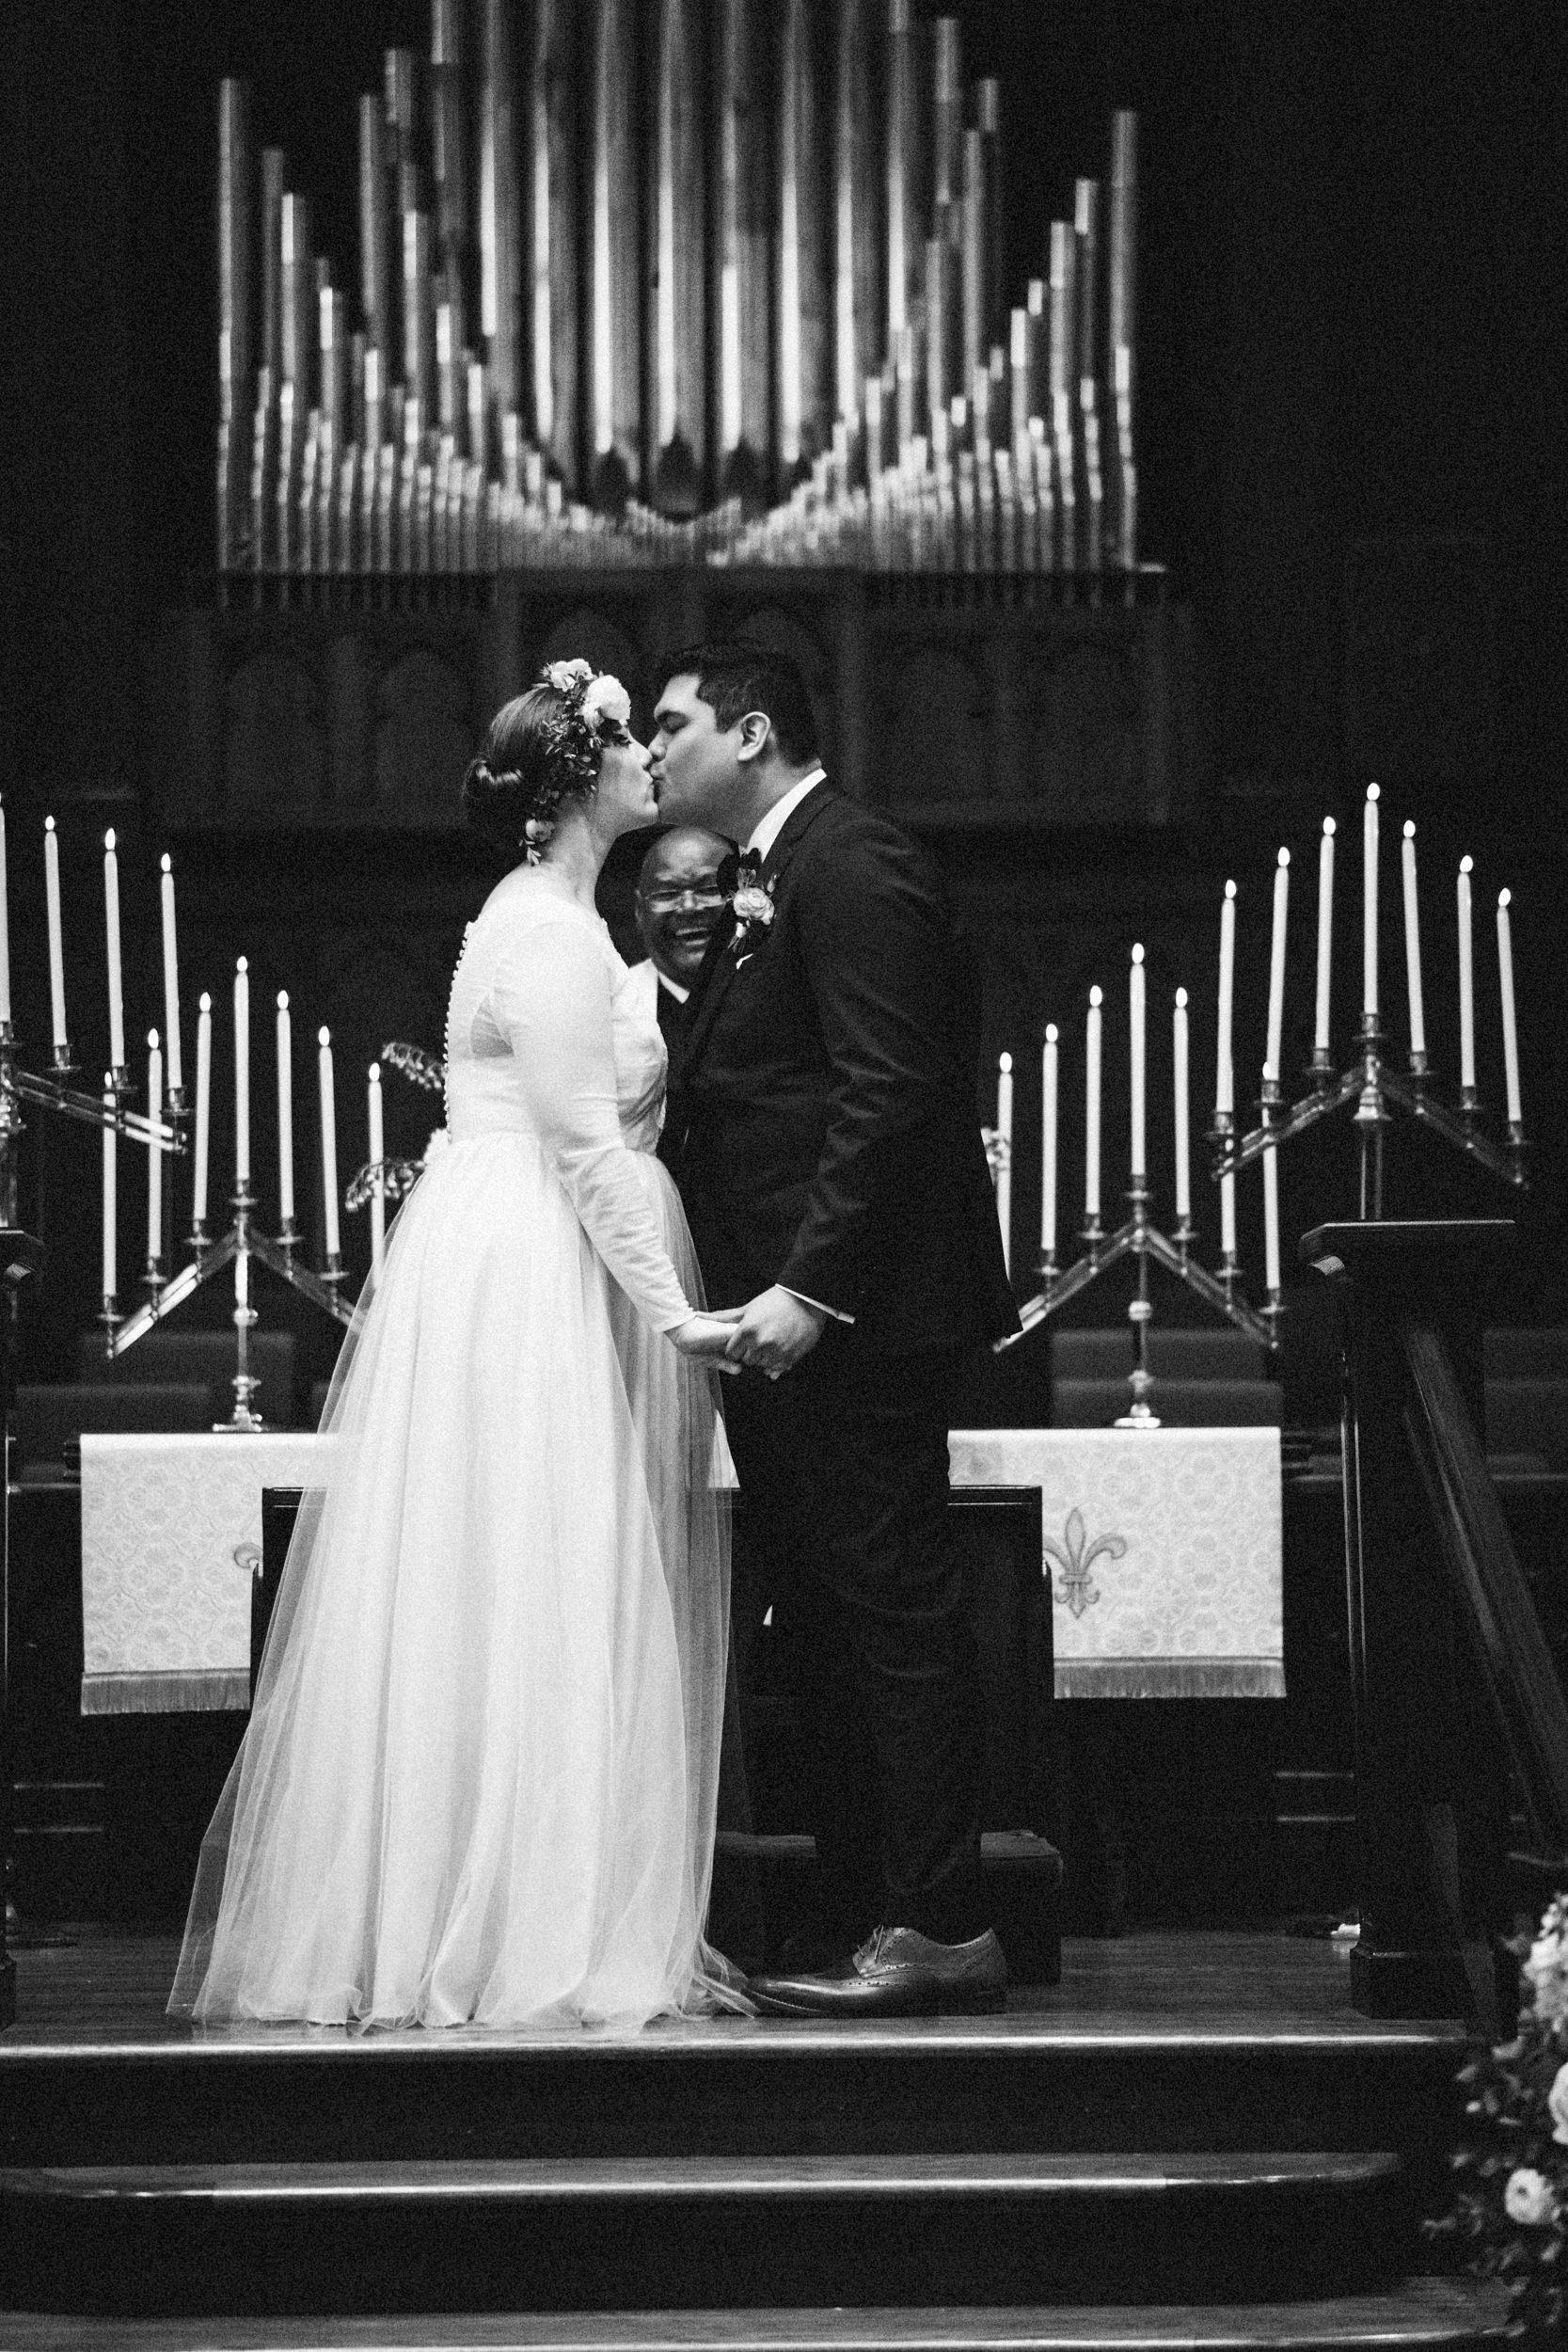 lauren-dean-wedding-grand-lodge-kentucky-sarah-katherine-davis-photography-399bw.jpg